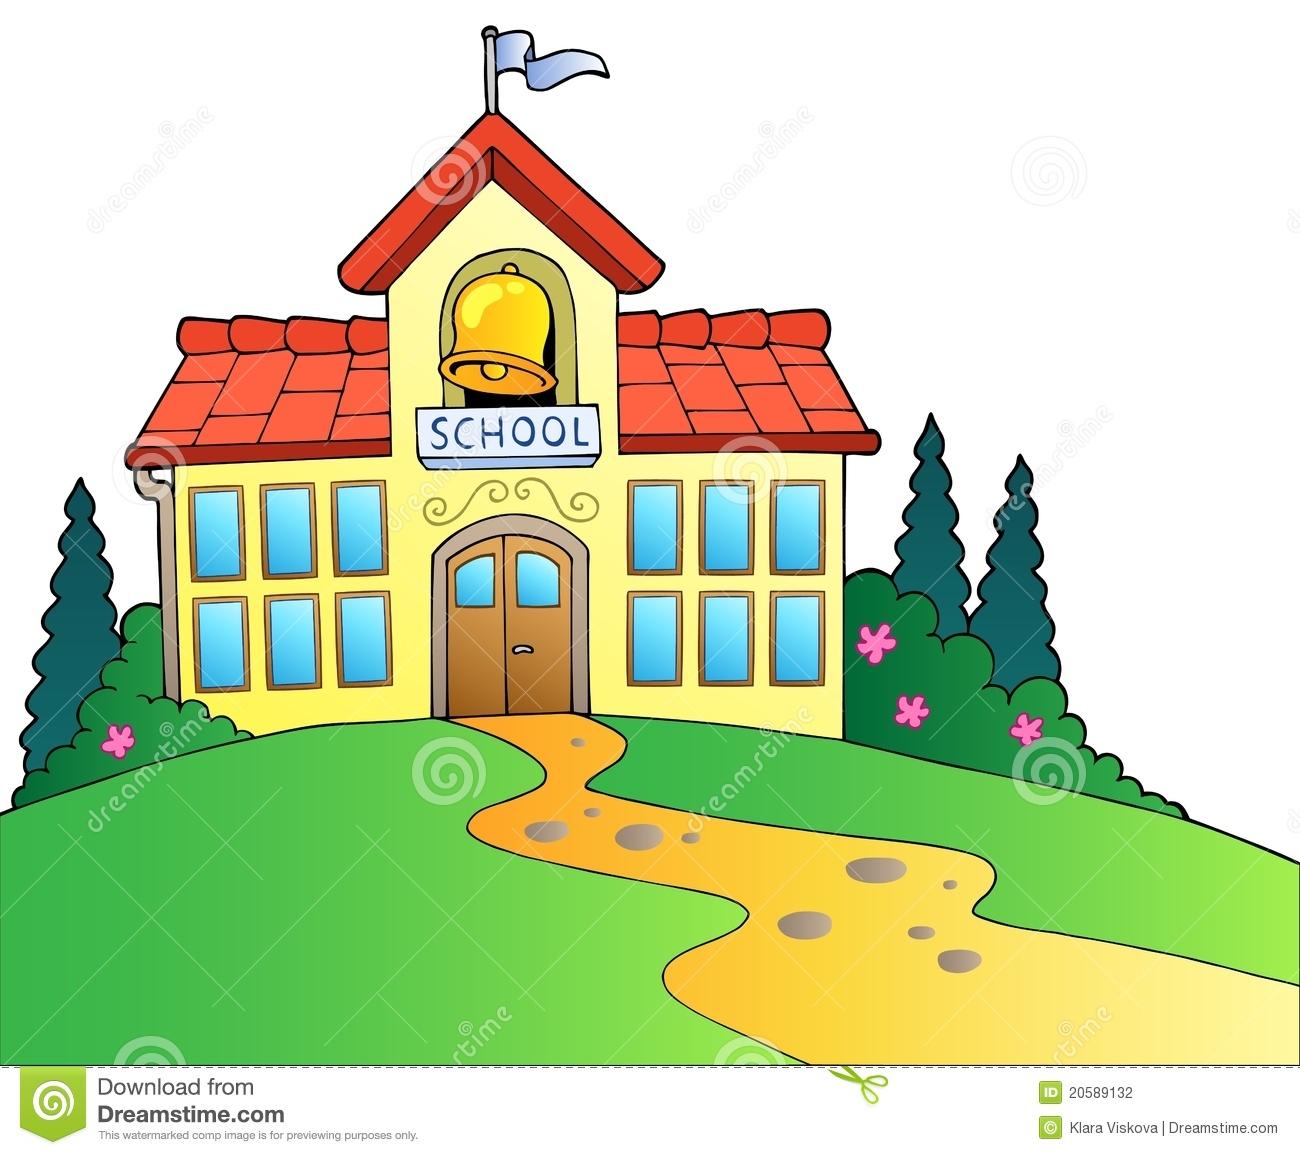 Building clipart pre school Art Clipart Clip Clipart college%20building%20clip%20art